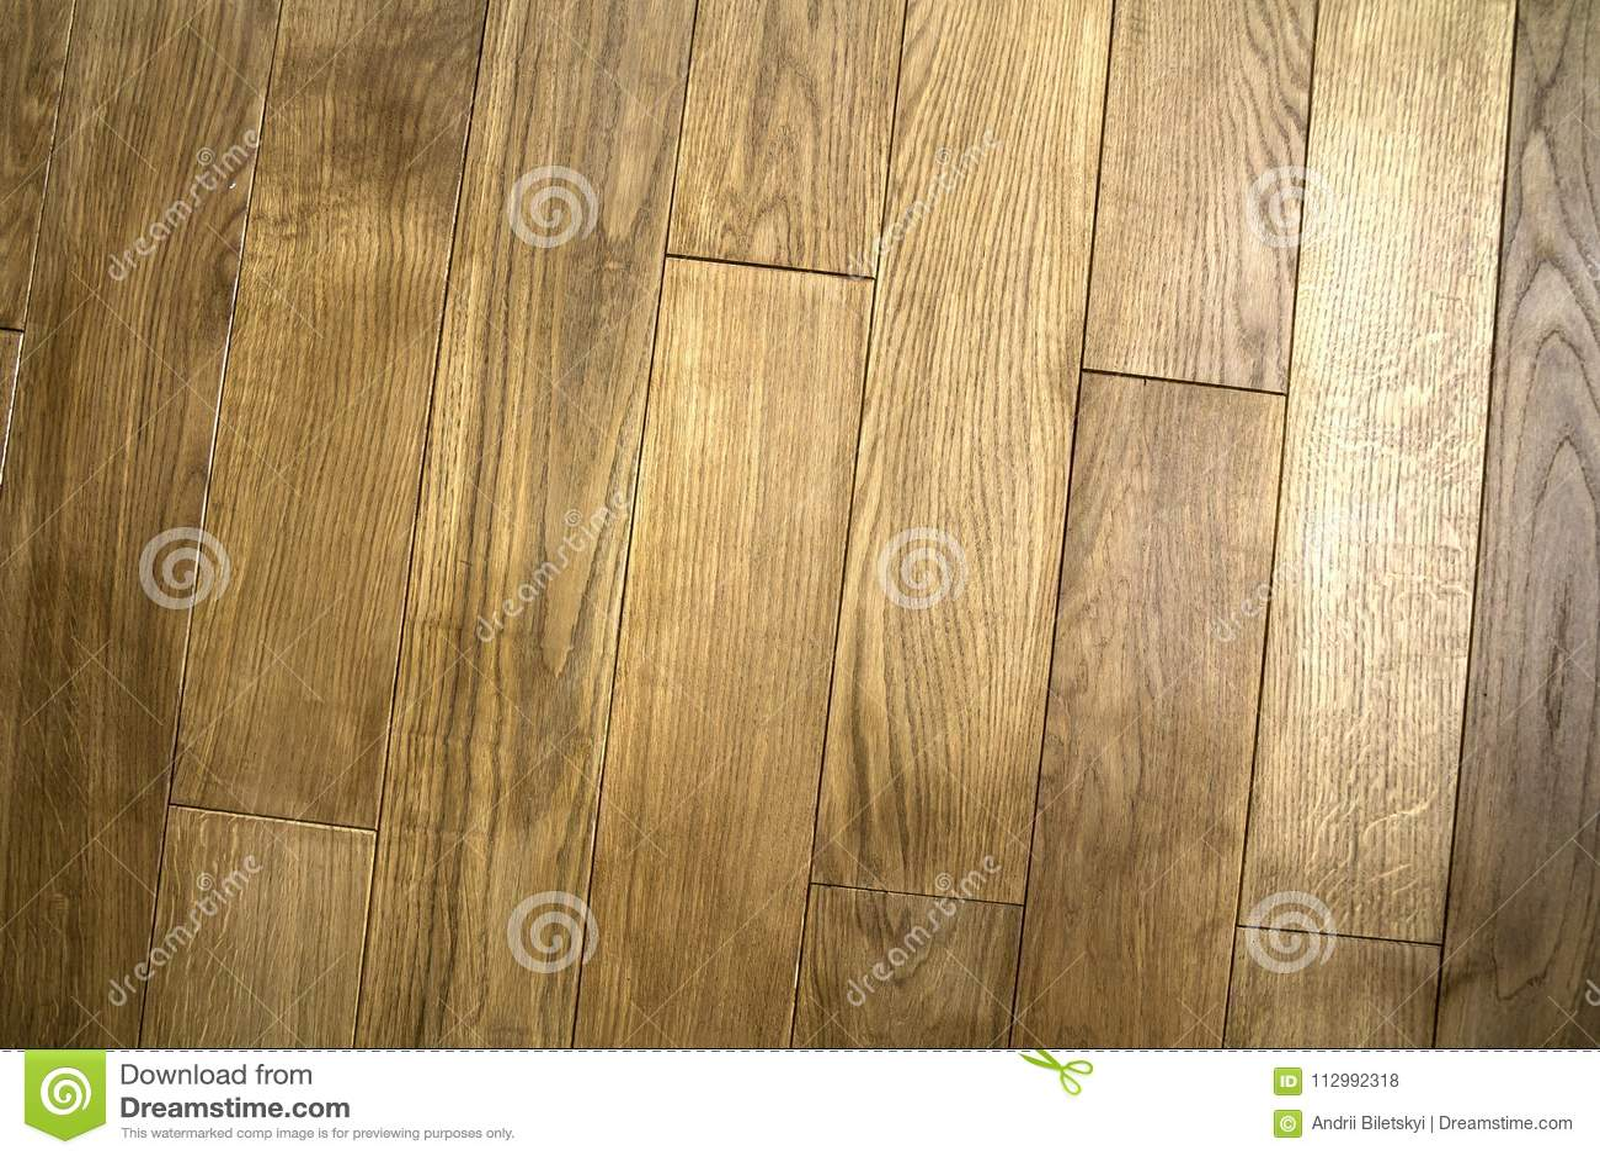 Natural brown texture wooden parquet floor boards